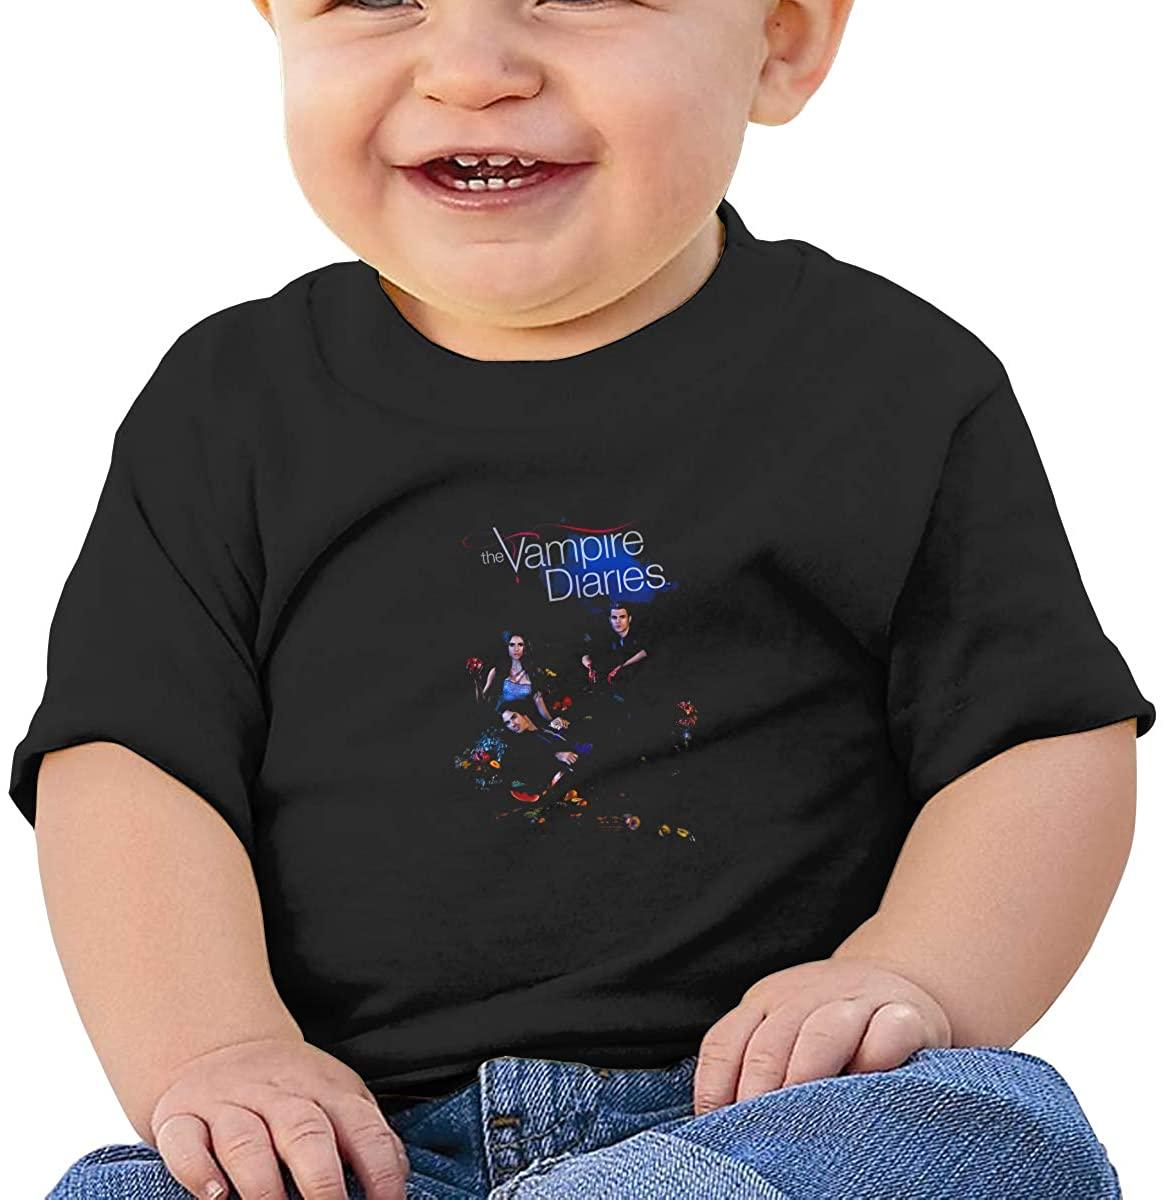 Fanniemo Vampire Diaries Infant 100% Cotton Jersey Short Sleeve Tee